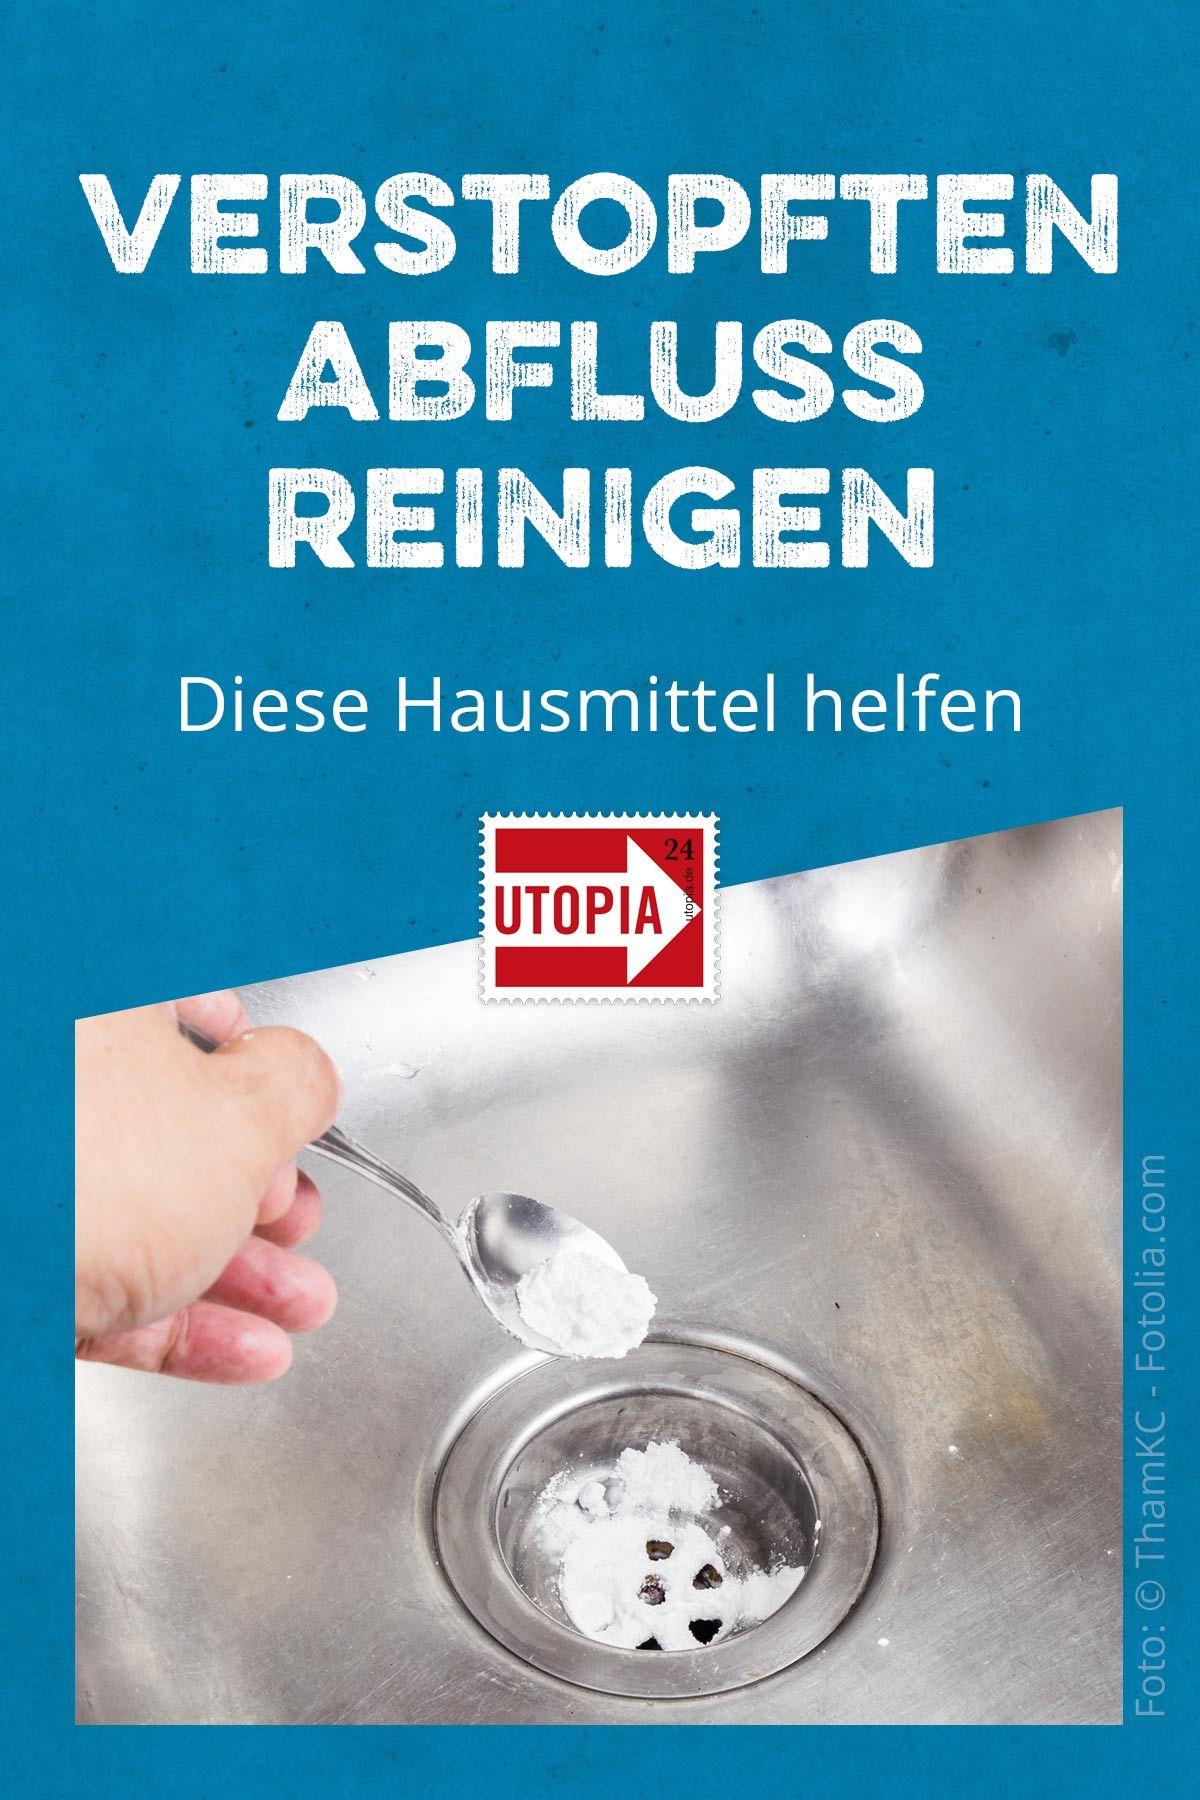 Verstopften Abfluss reinigen: Diese Hausmittel helfen - Utopia.de | Verstopfte  abflüsse, Hausmittel, Reinigen